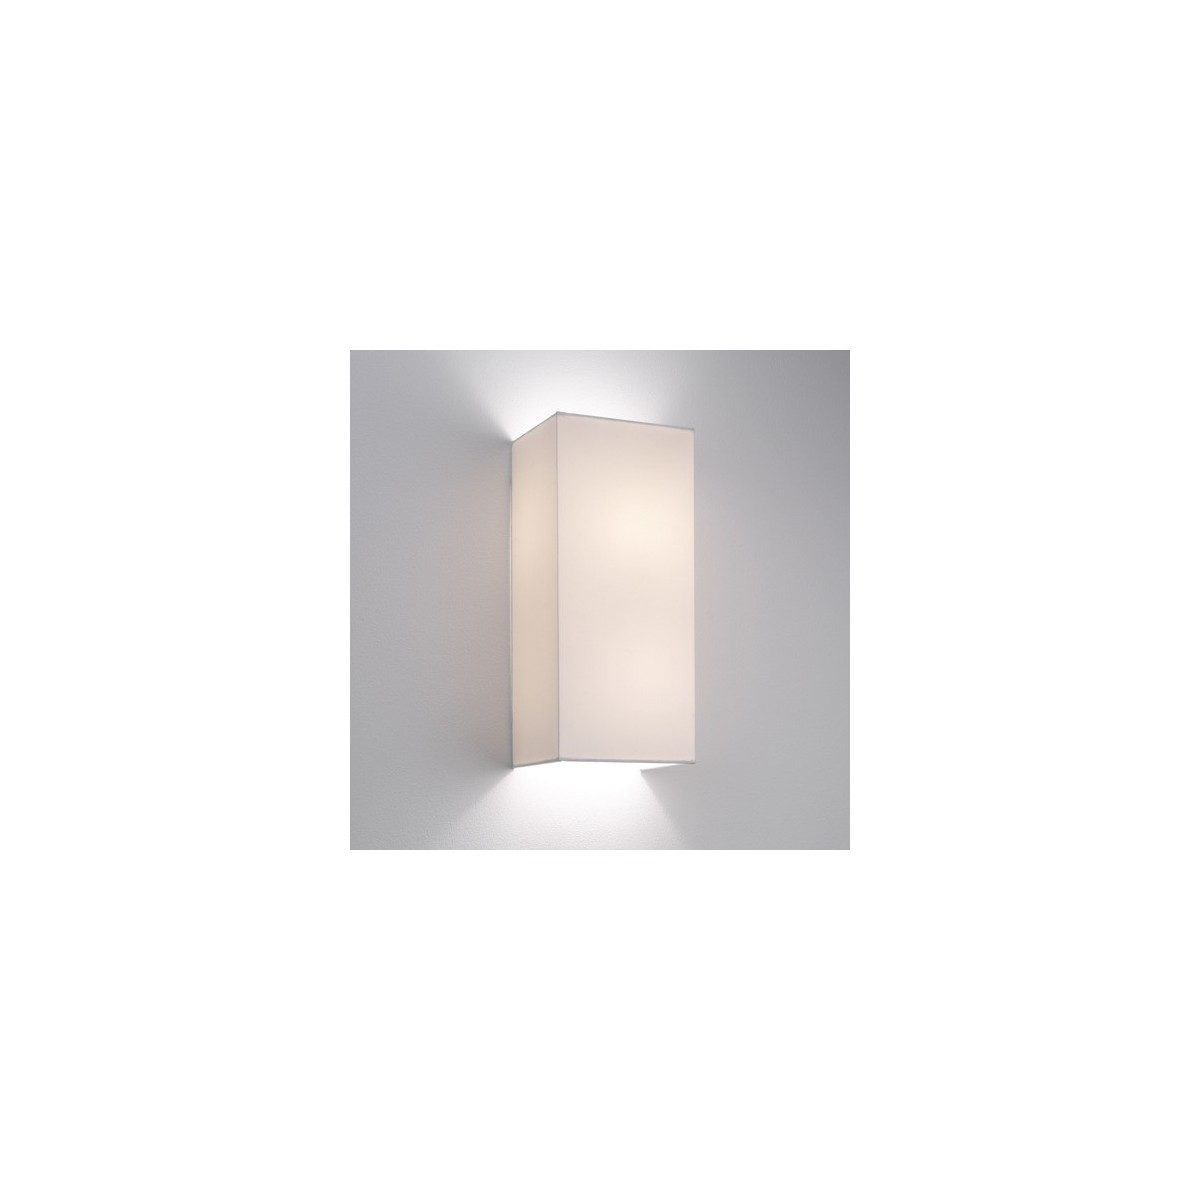 Astro Chuo Rectangle 380 Abażur Biały 5024001